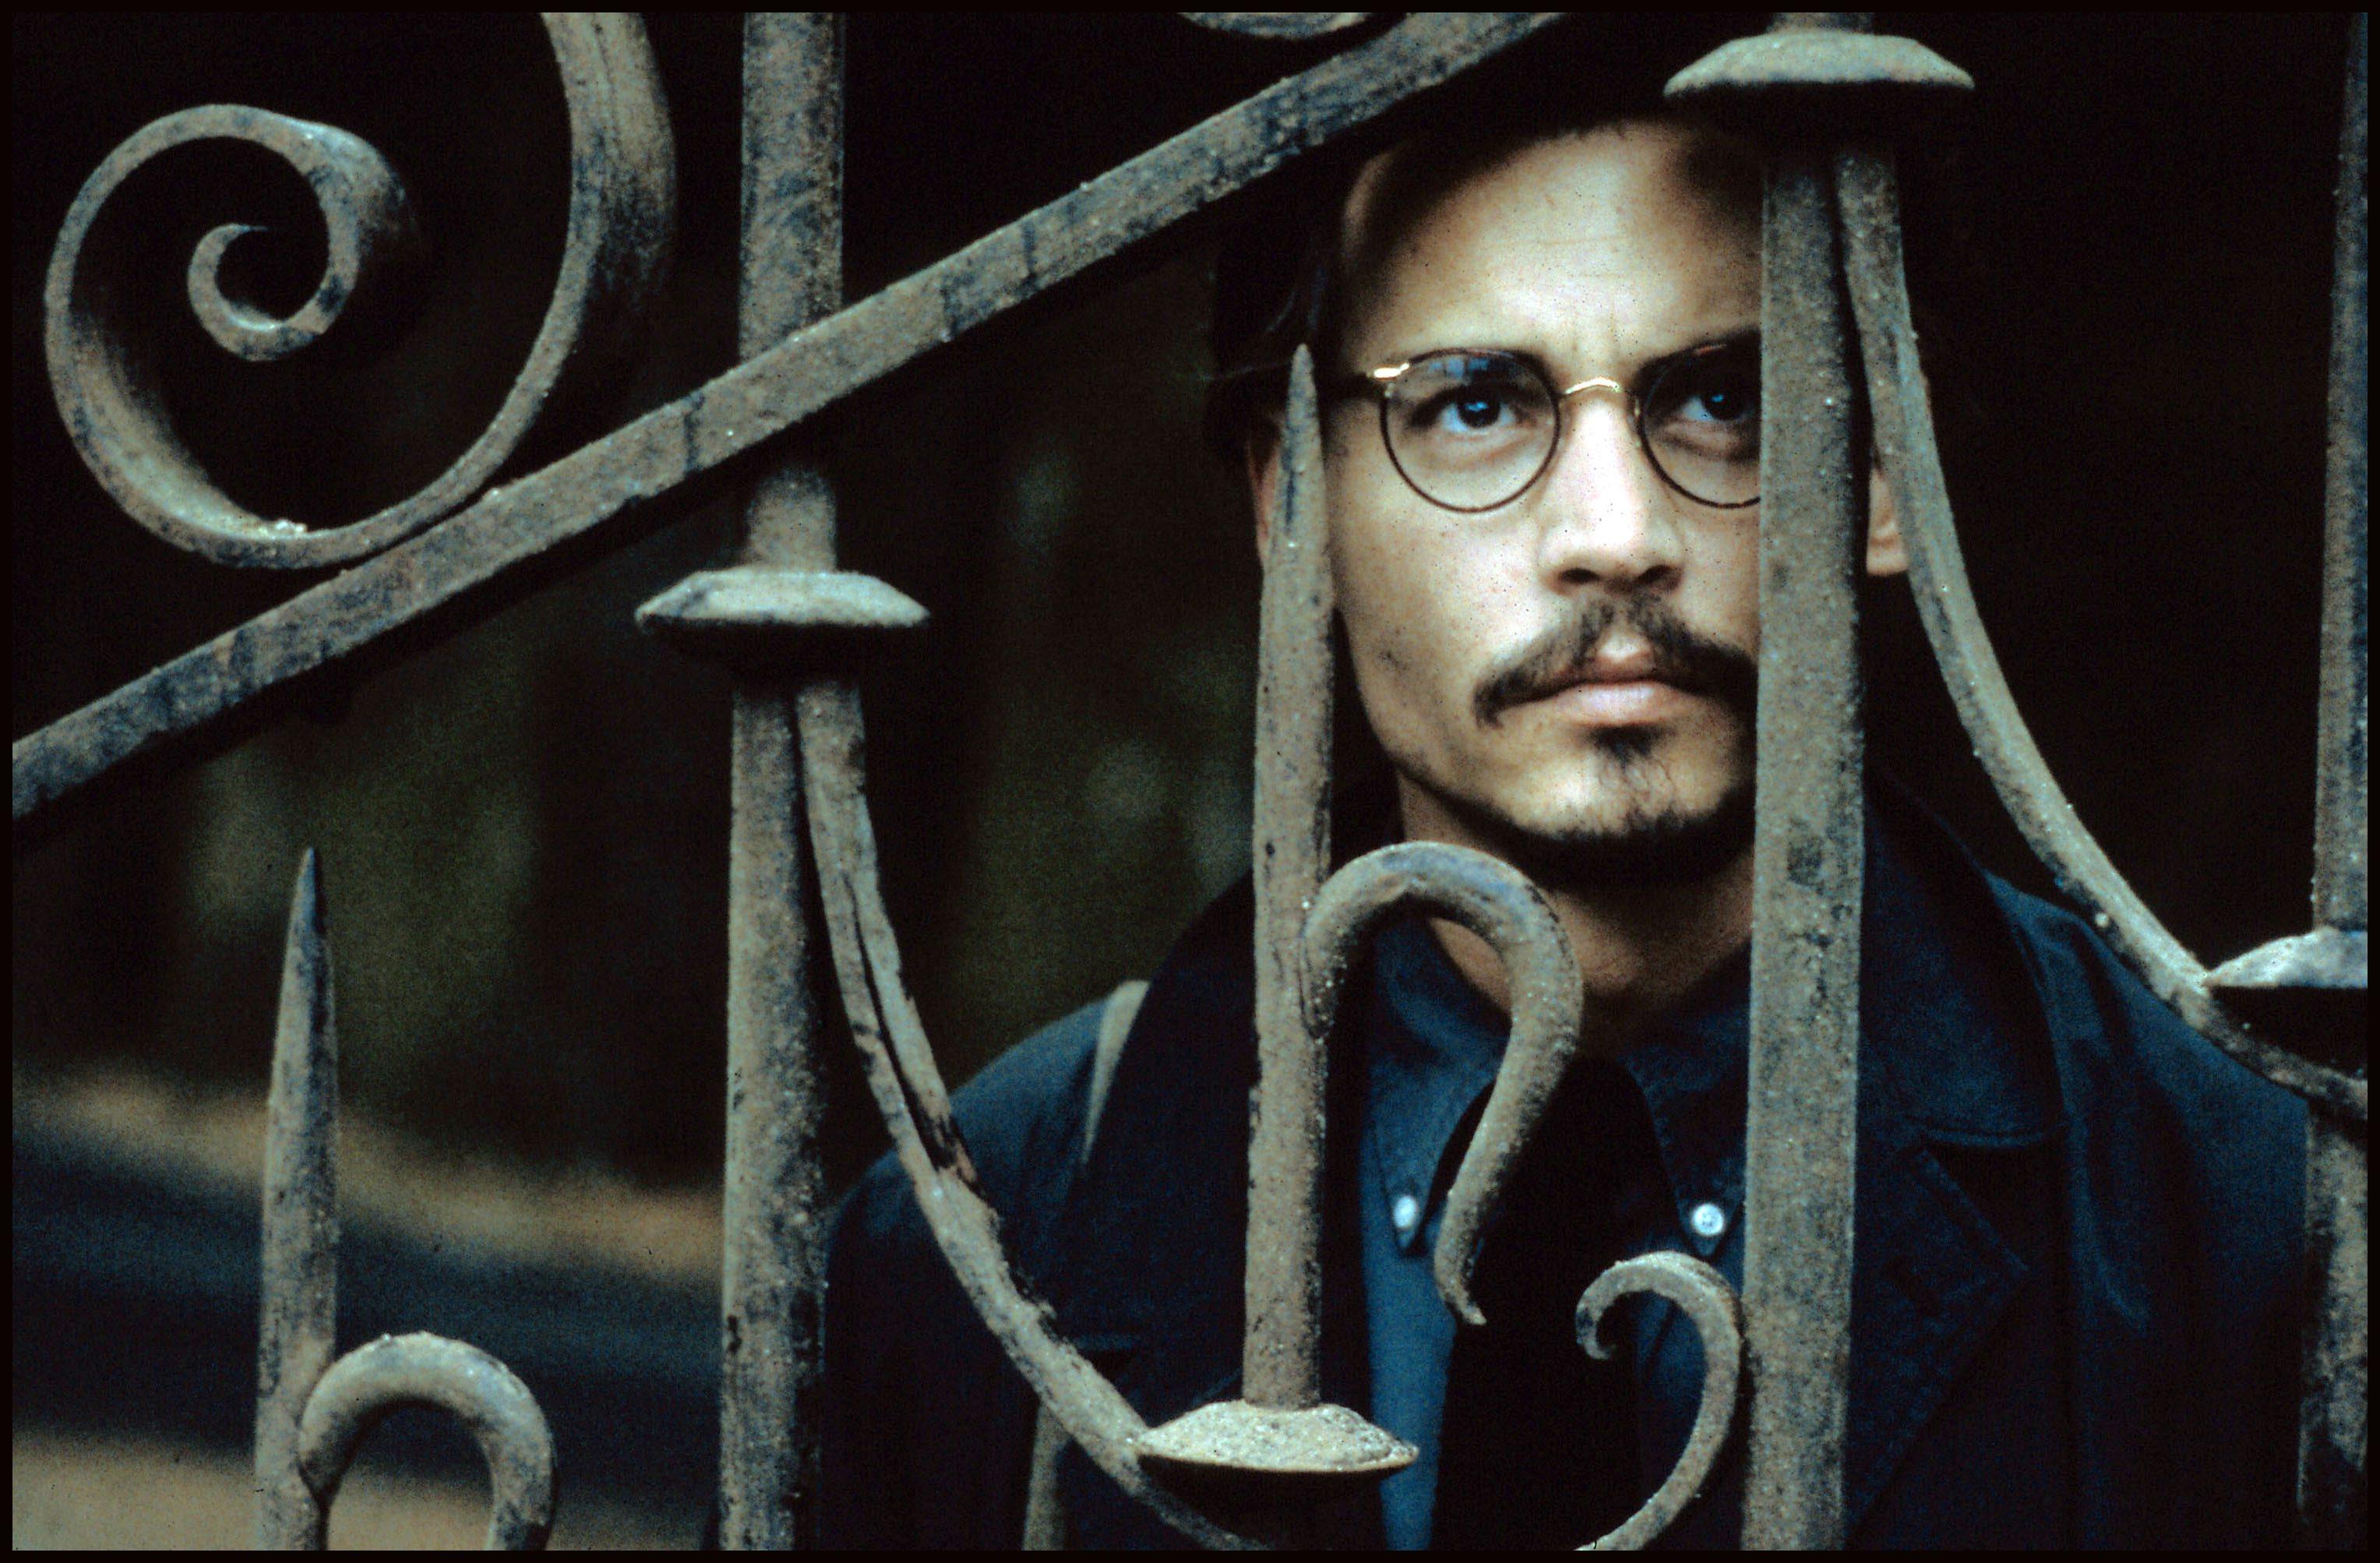 Johnny Depp: The Ninth Gate